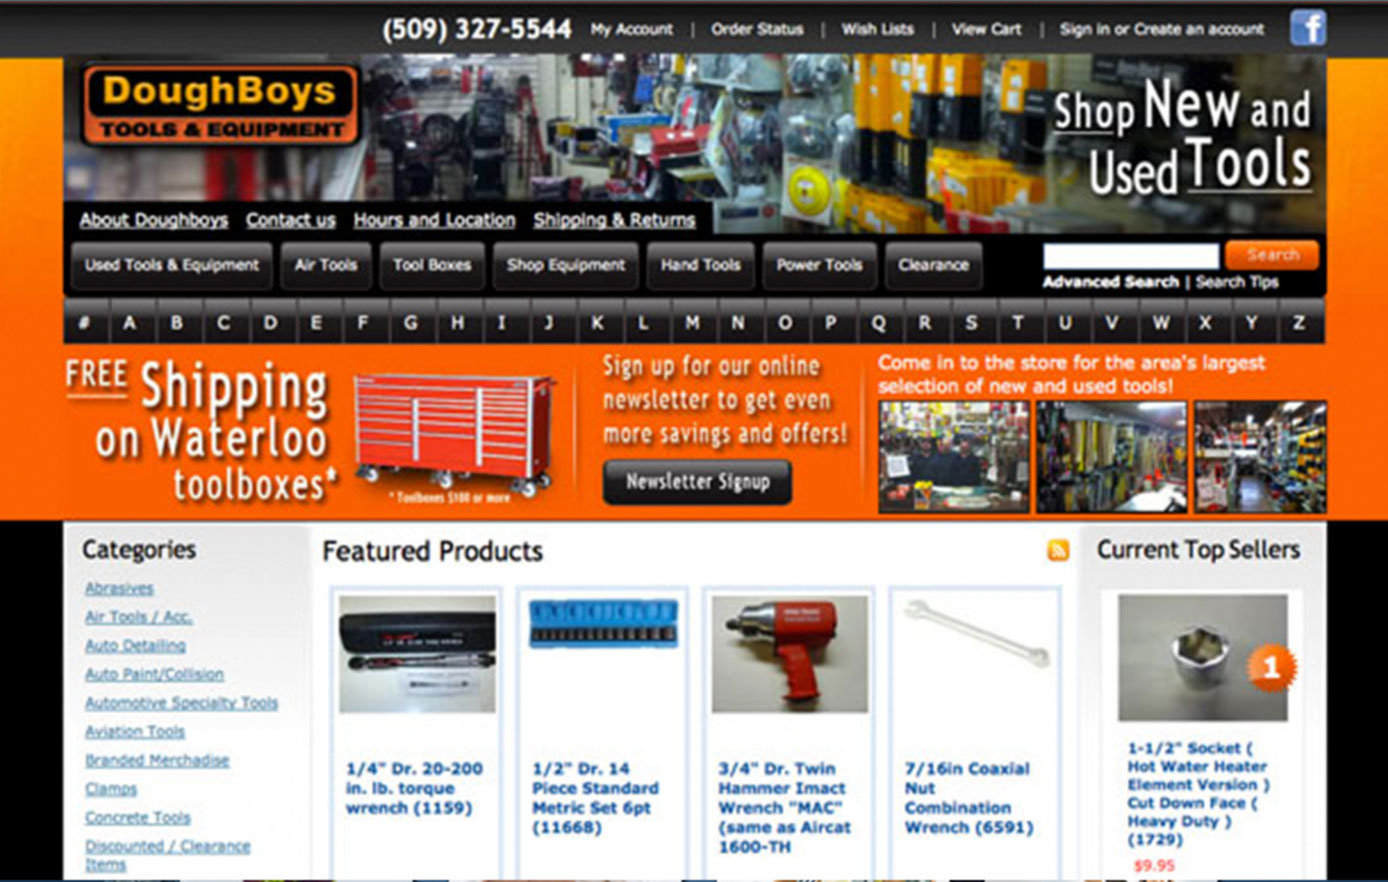 doughboys tools and equipment, website design